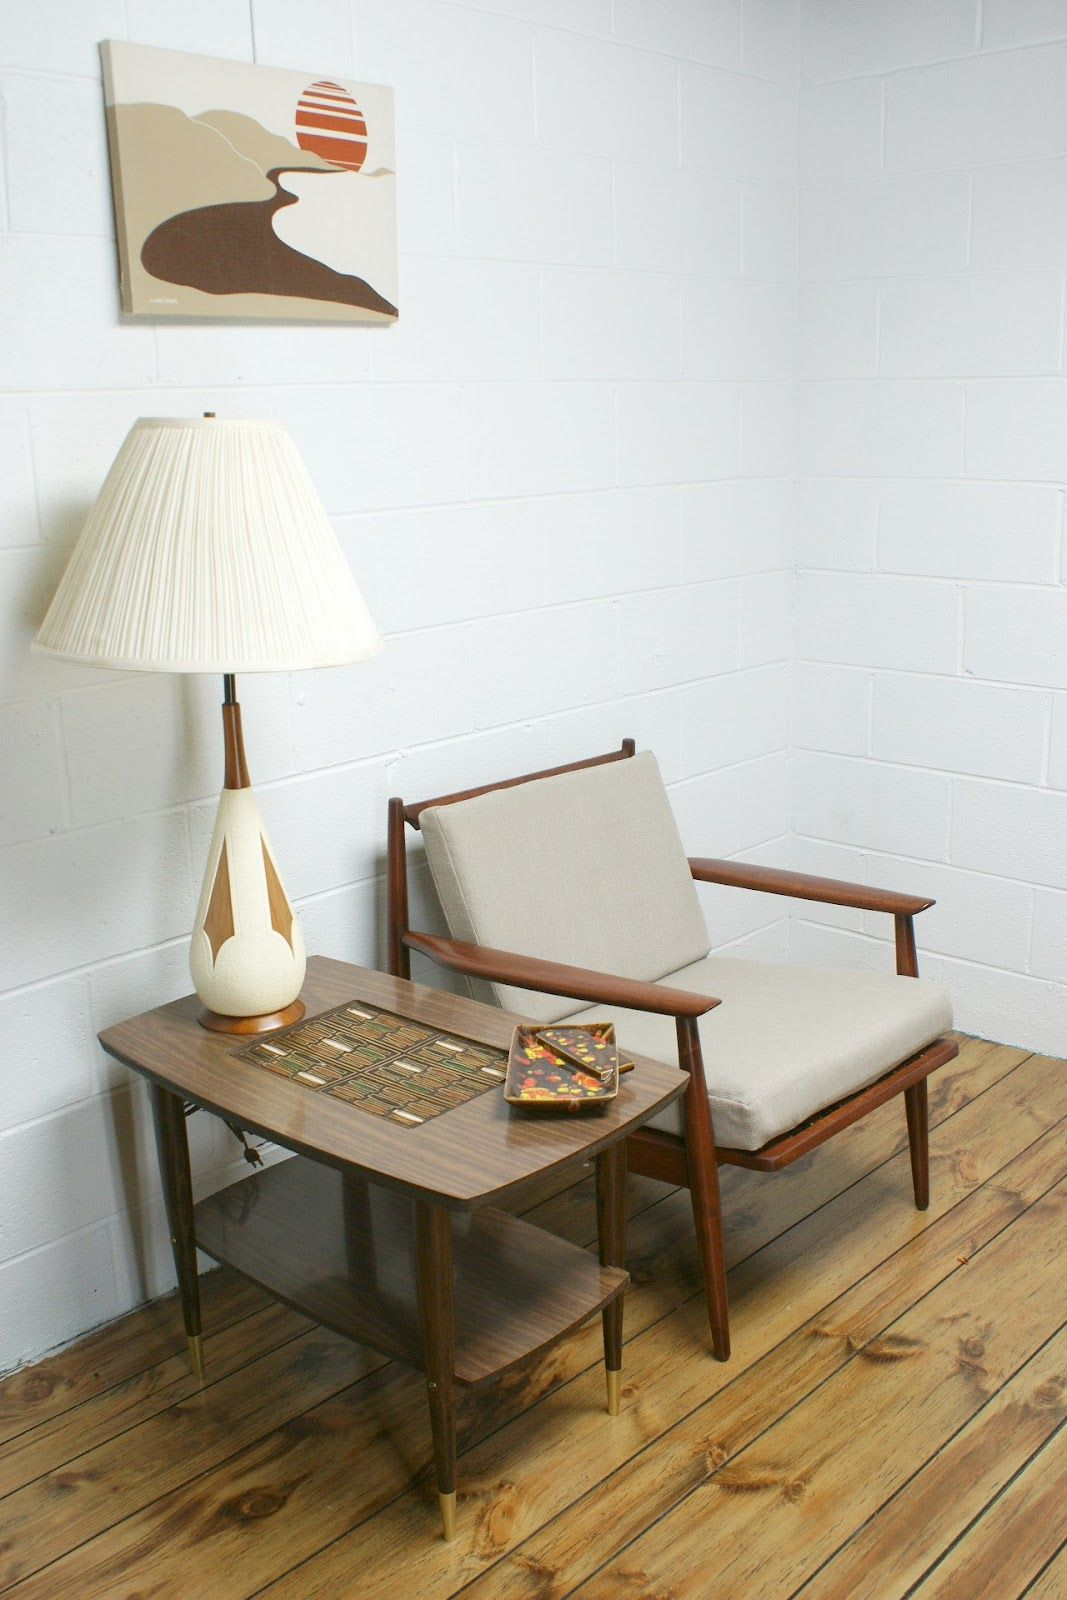 Vintage 60s decor vintage 50s 60s mid century modern eames era mad men side end table